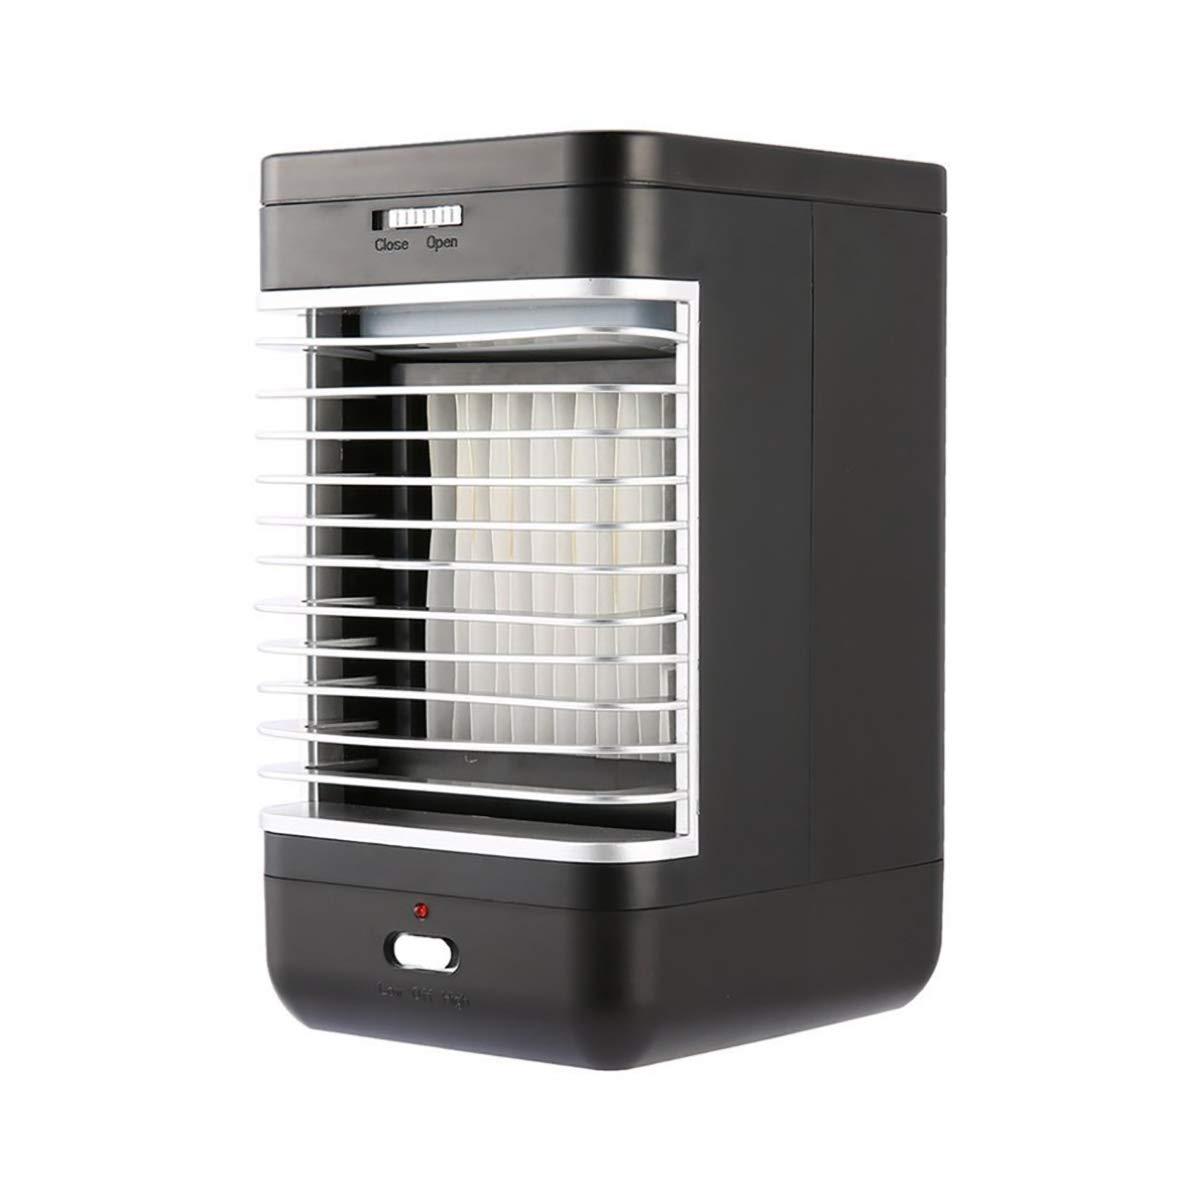 LIUHUA Personal Air Conditioner Cooler Evaporative Air Conditioner Fan Indoor Portable Coolm, Humidifier